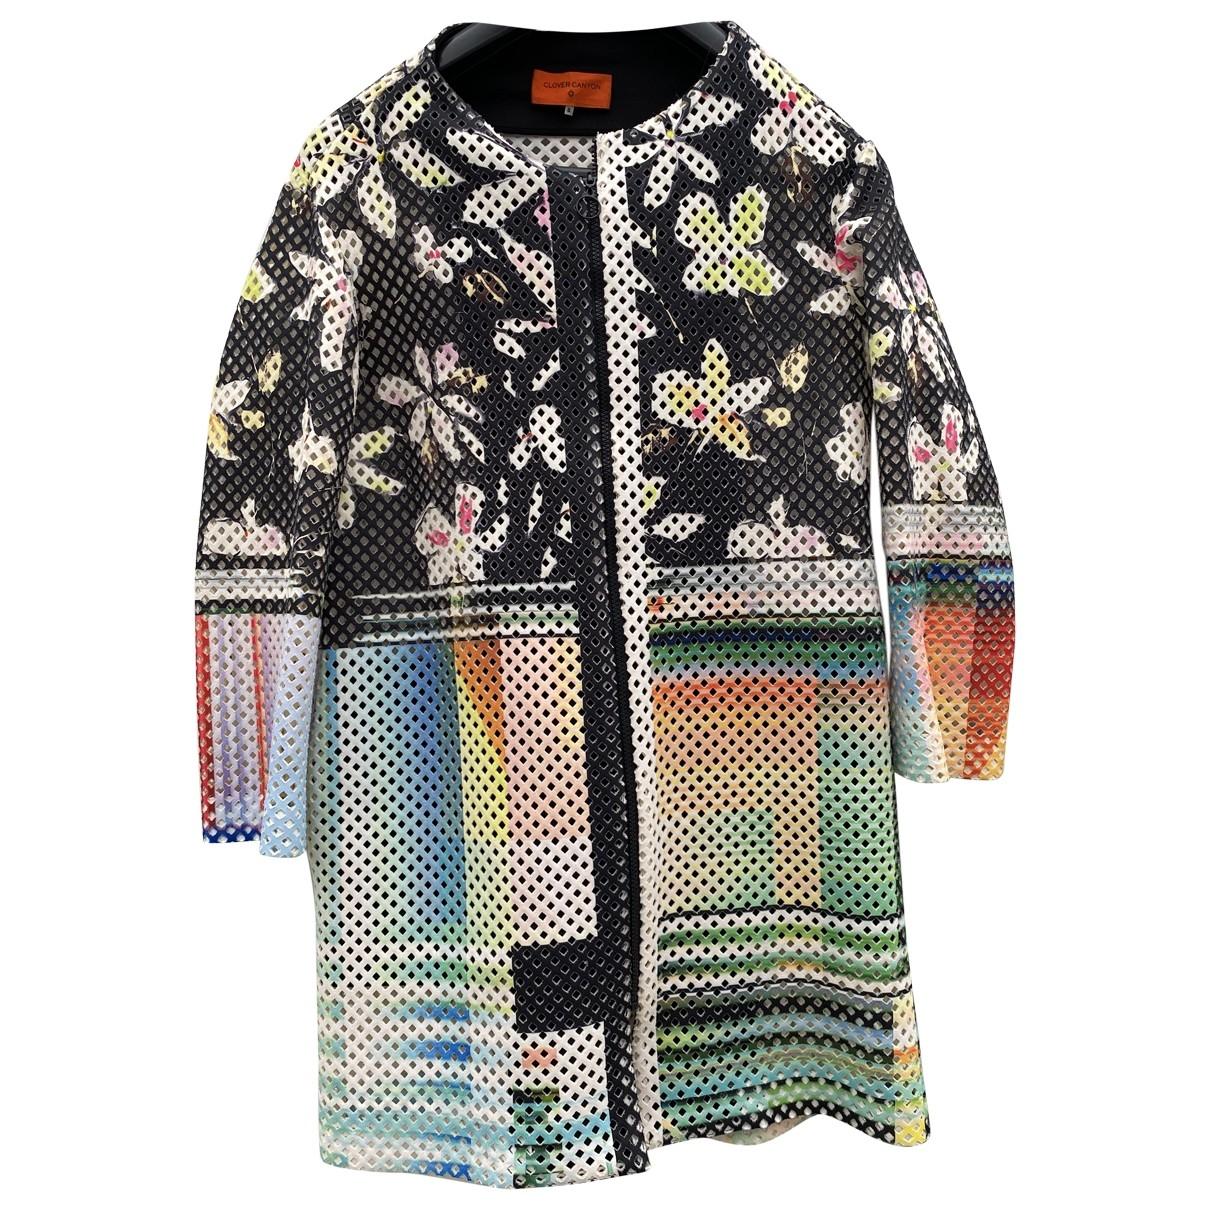 Clover Canyon \N Multicolour jacket for Women S International